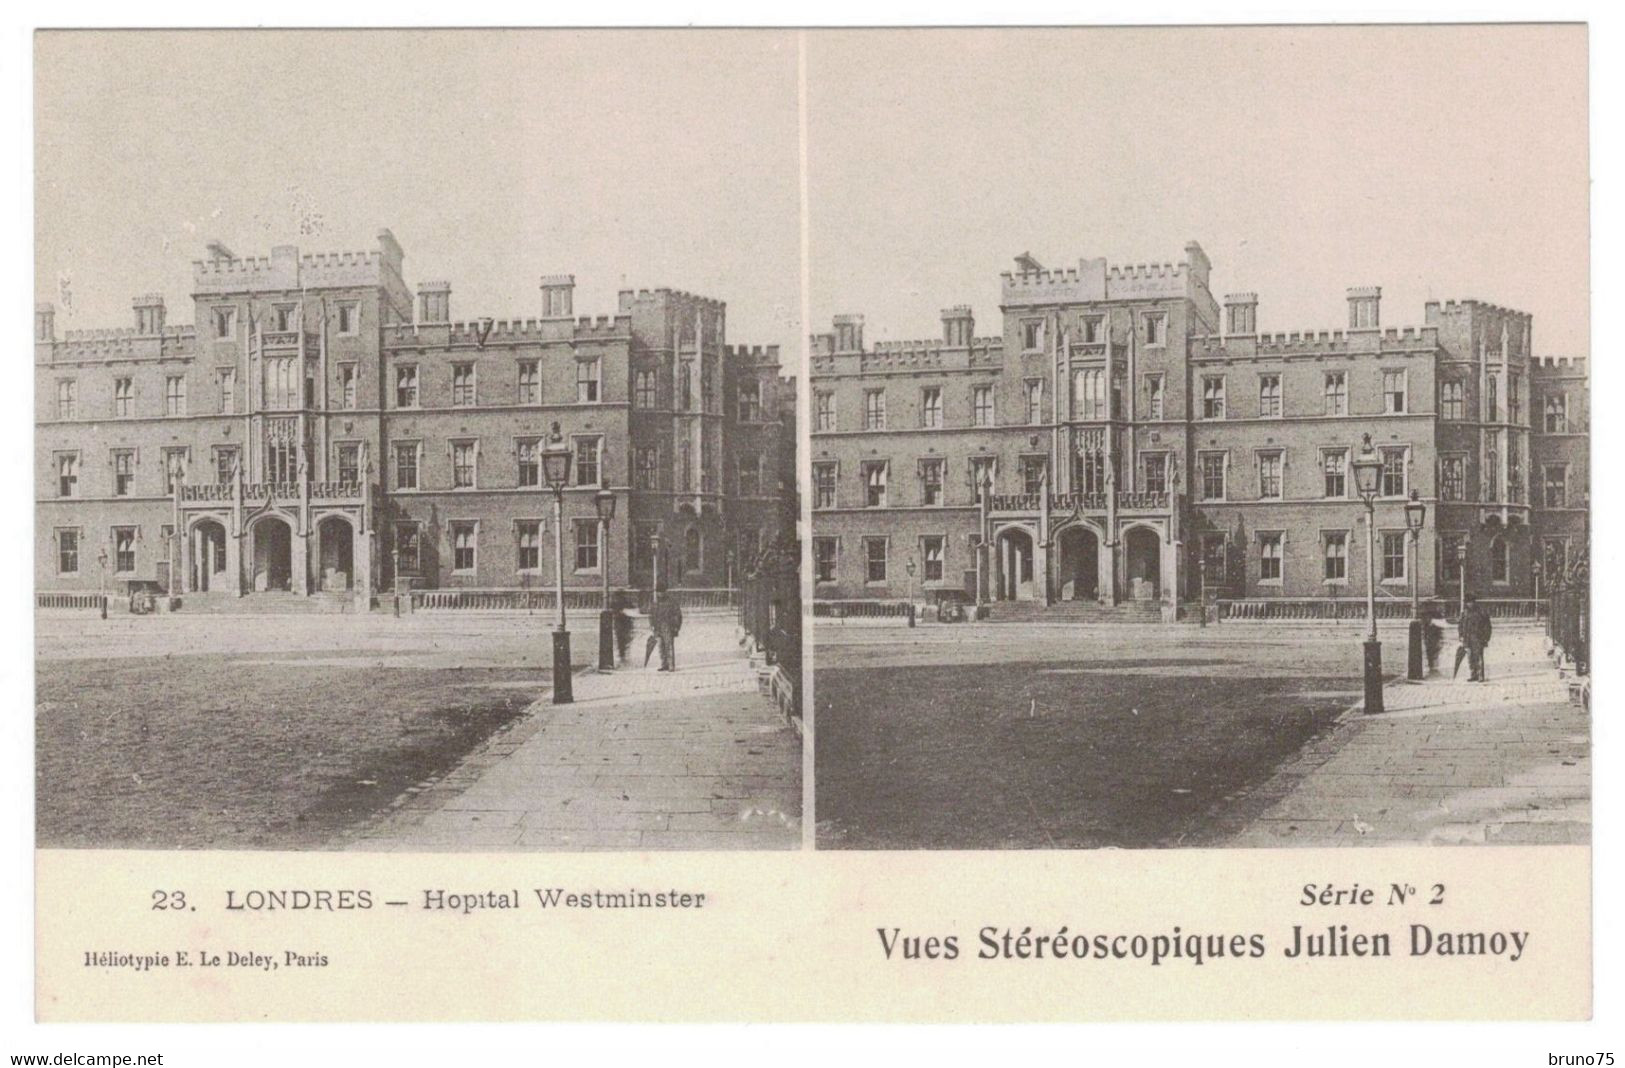 LONDRES - Hopital Westminster - Vues Stéréoscopiques Julien Damoy - 23 - Série N° 2 - Cartoline Stereoscopiche